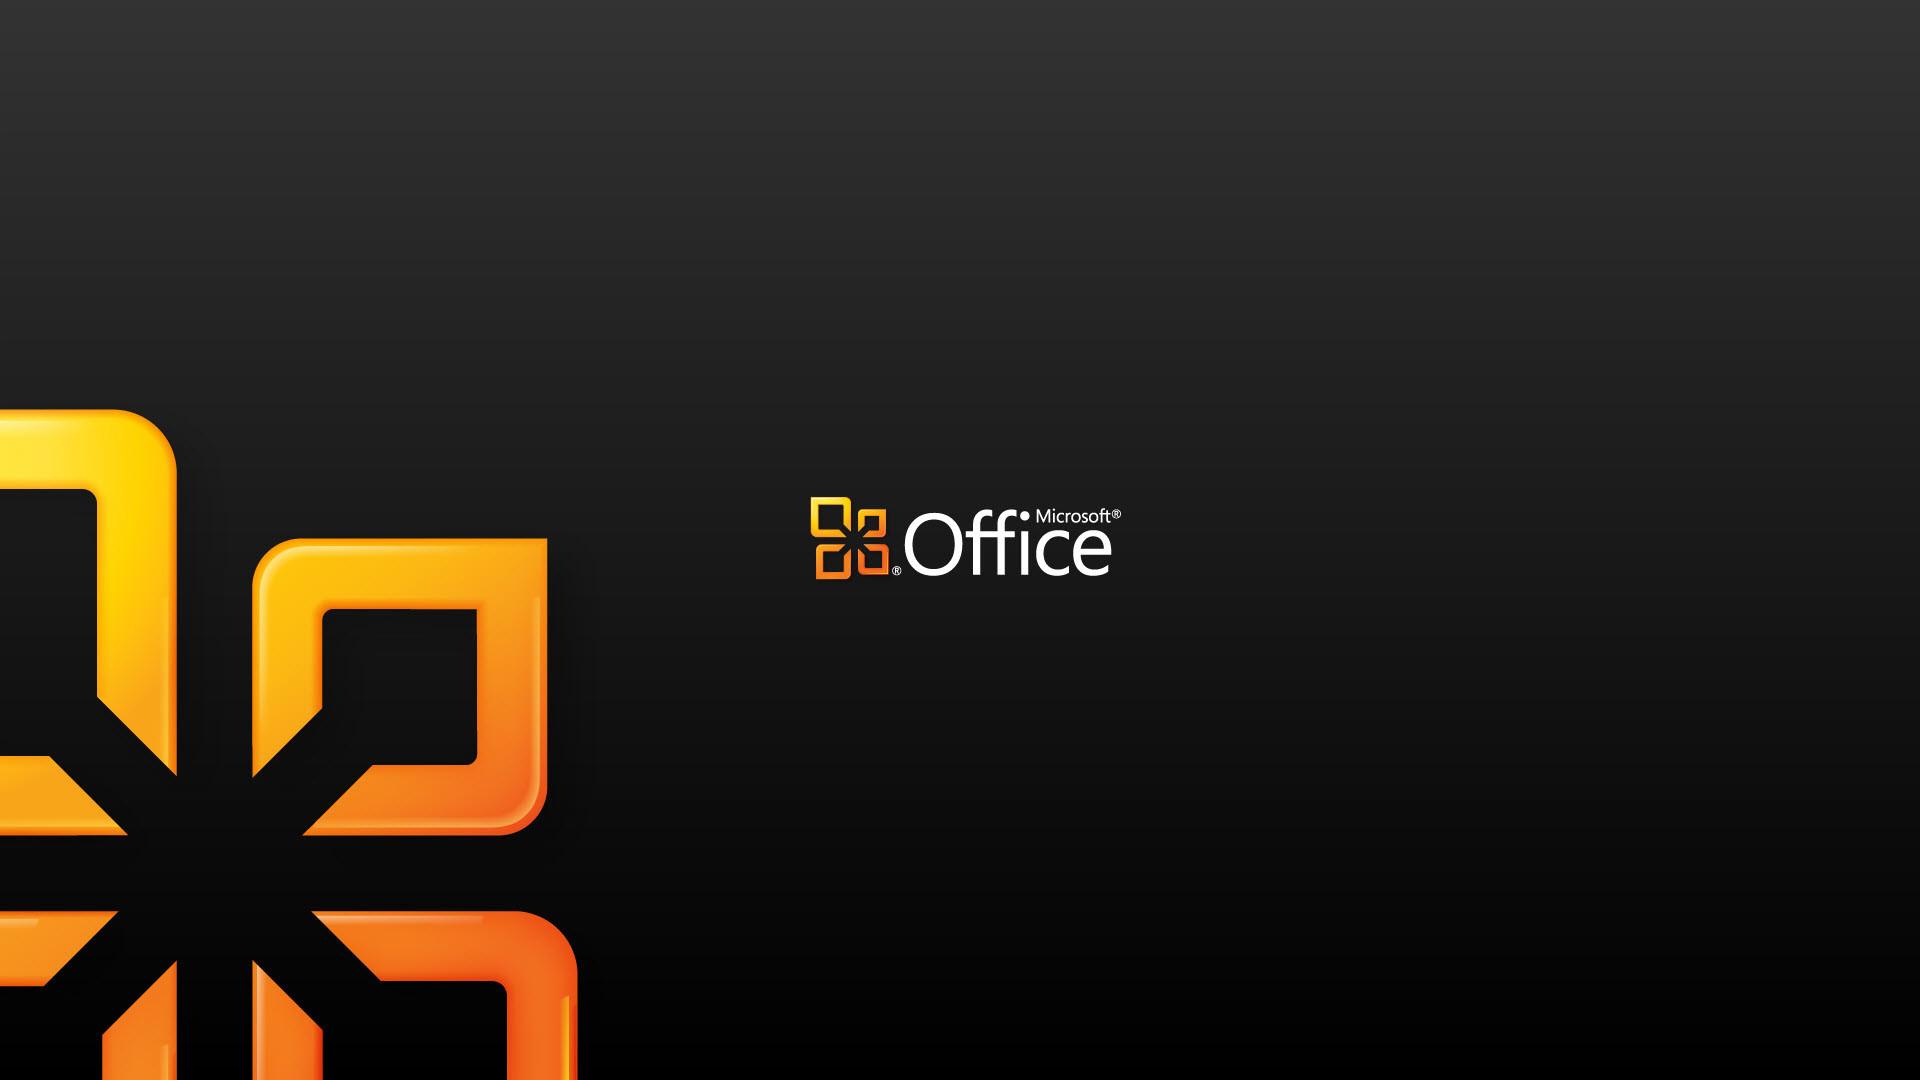 The Office Desktop Wallpaper 53 Pictures